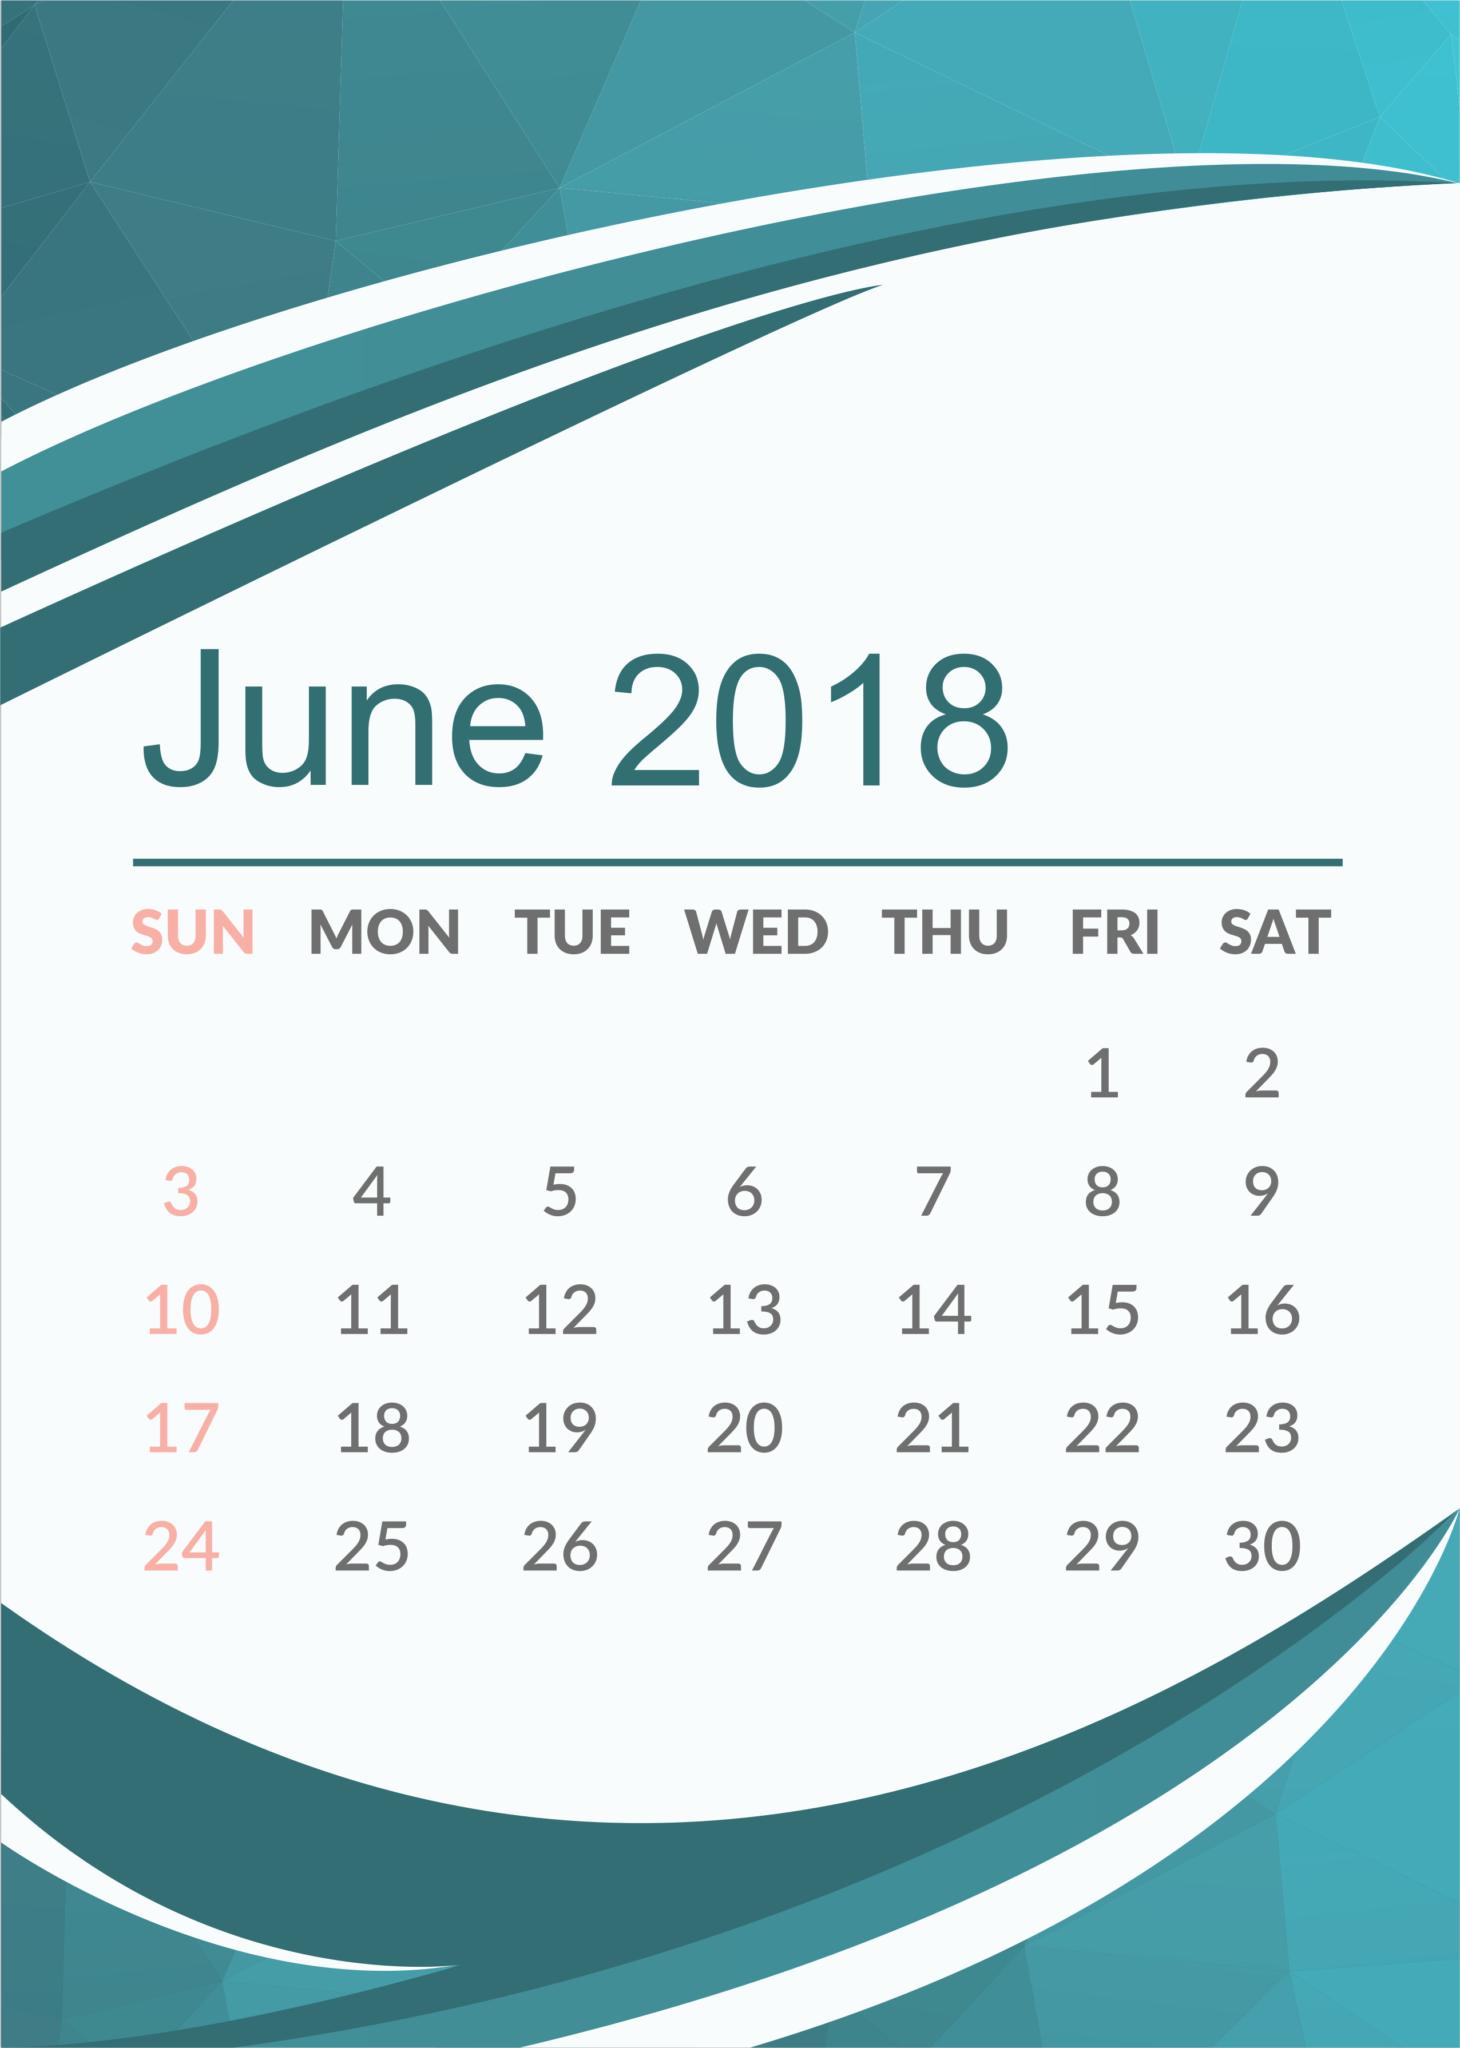 June 2018 Calendar Wallpaper